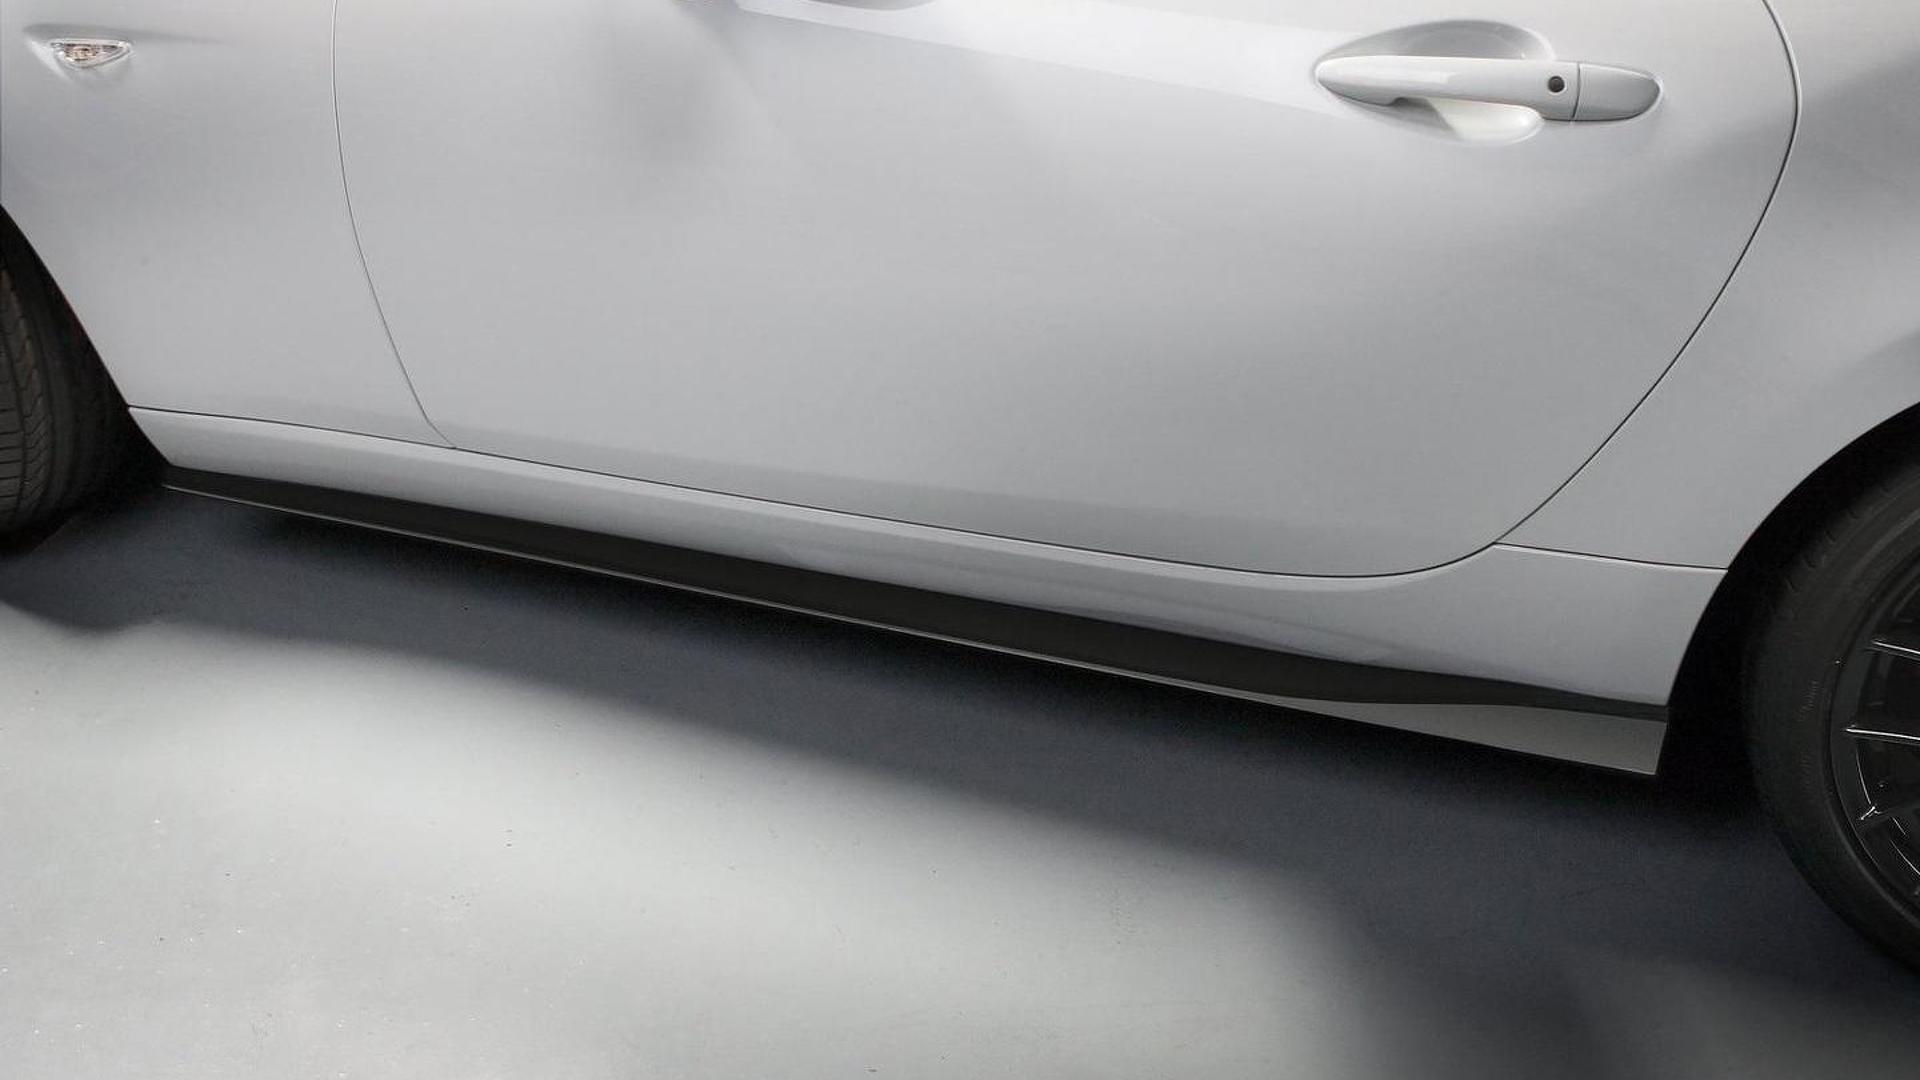 https://icdn-6.motor1.com/images/mgl/z9AL8/s1/2015-543918-2016-mazda-mx-5-accessories-design-concept1.jpg